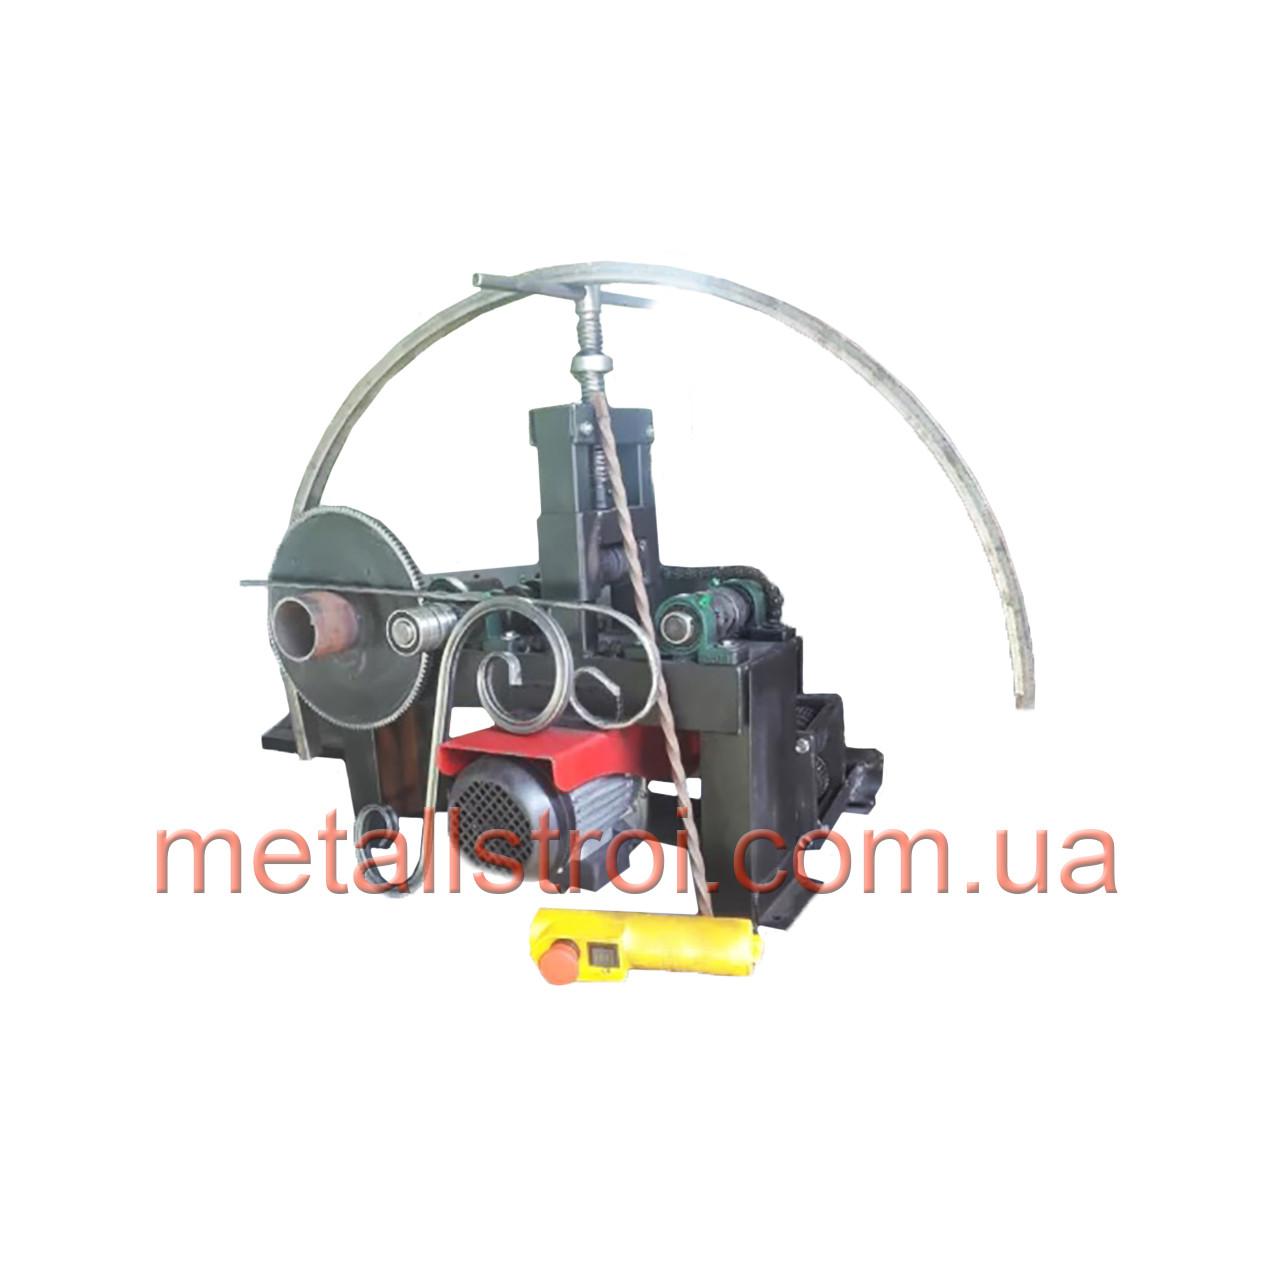 Трубогиб-профилегиб + ковка ТПК-3 с электроприводом